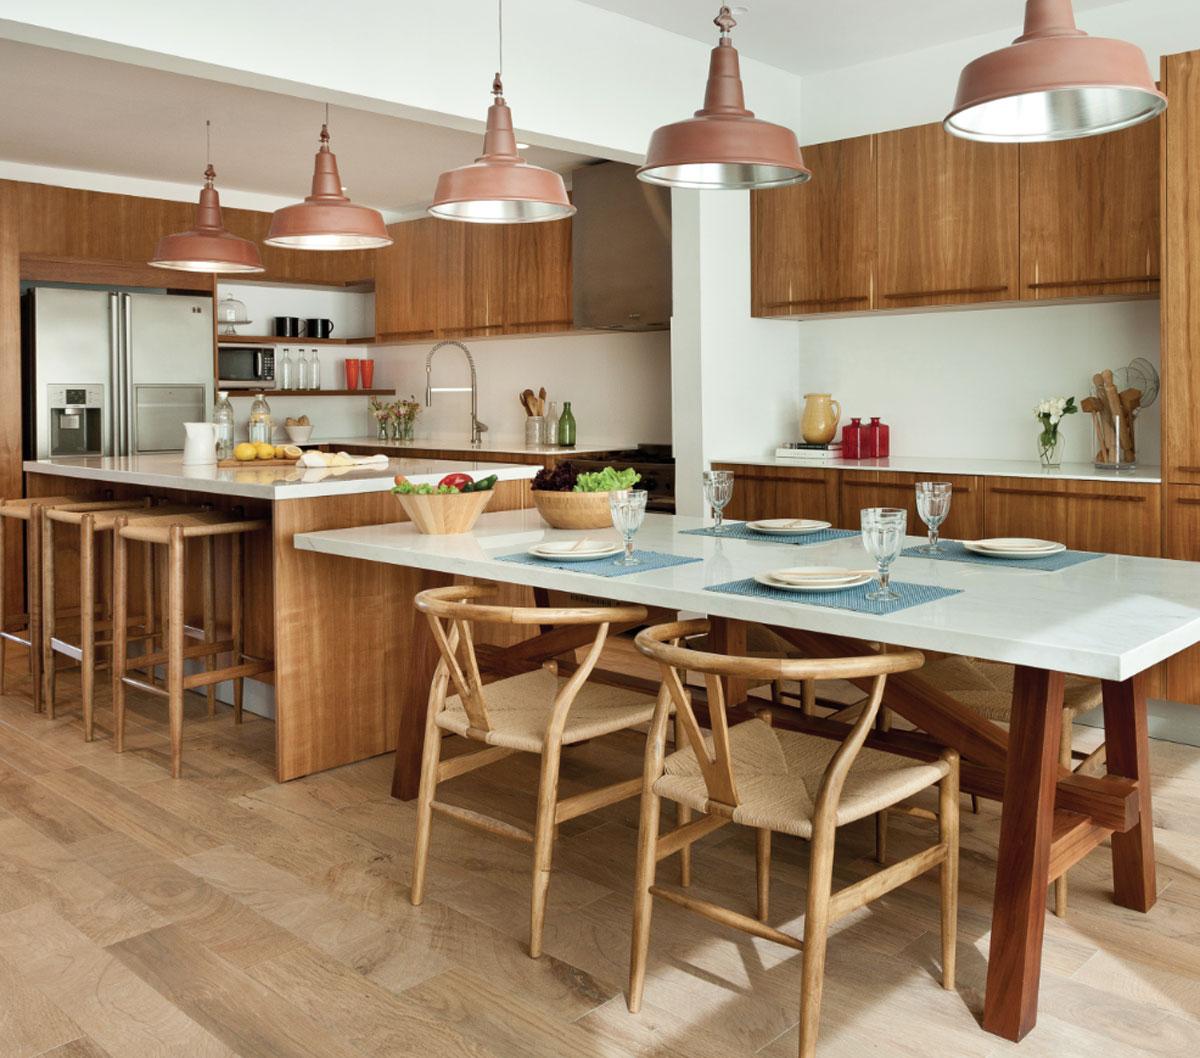 Mesas e islas en las cocinas de hoy - Arquimaster